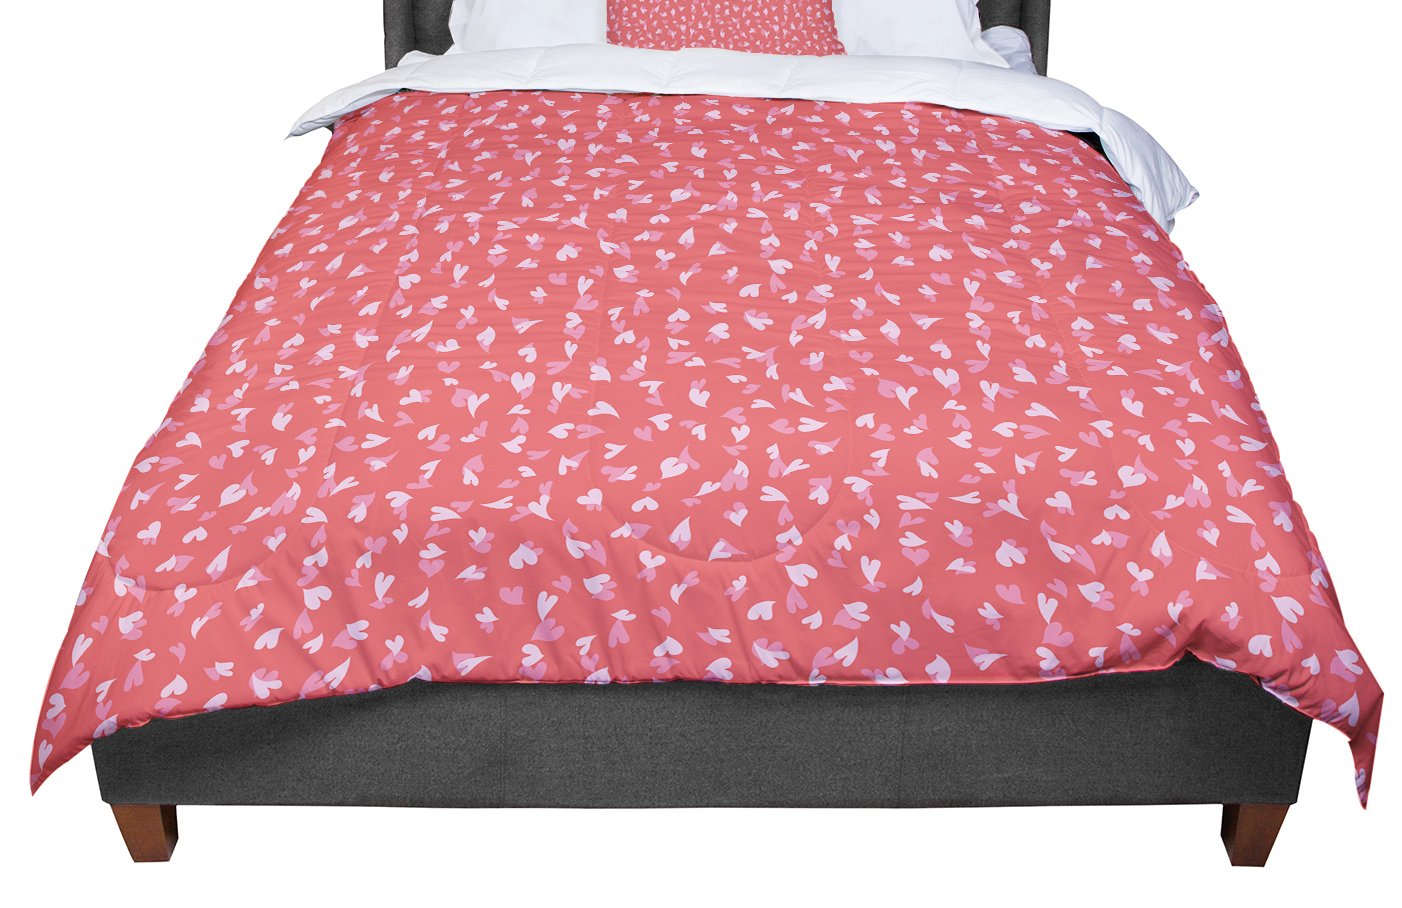 KESS InHouse Emma Frances Love Confetti King Cal King Comforter 104 X 88